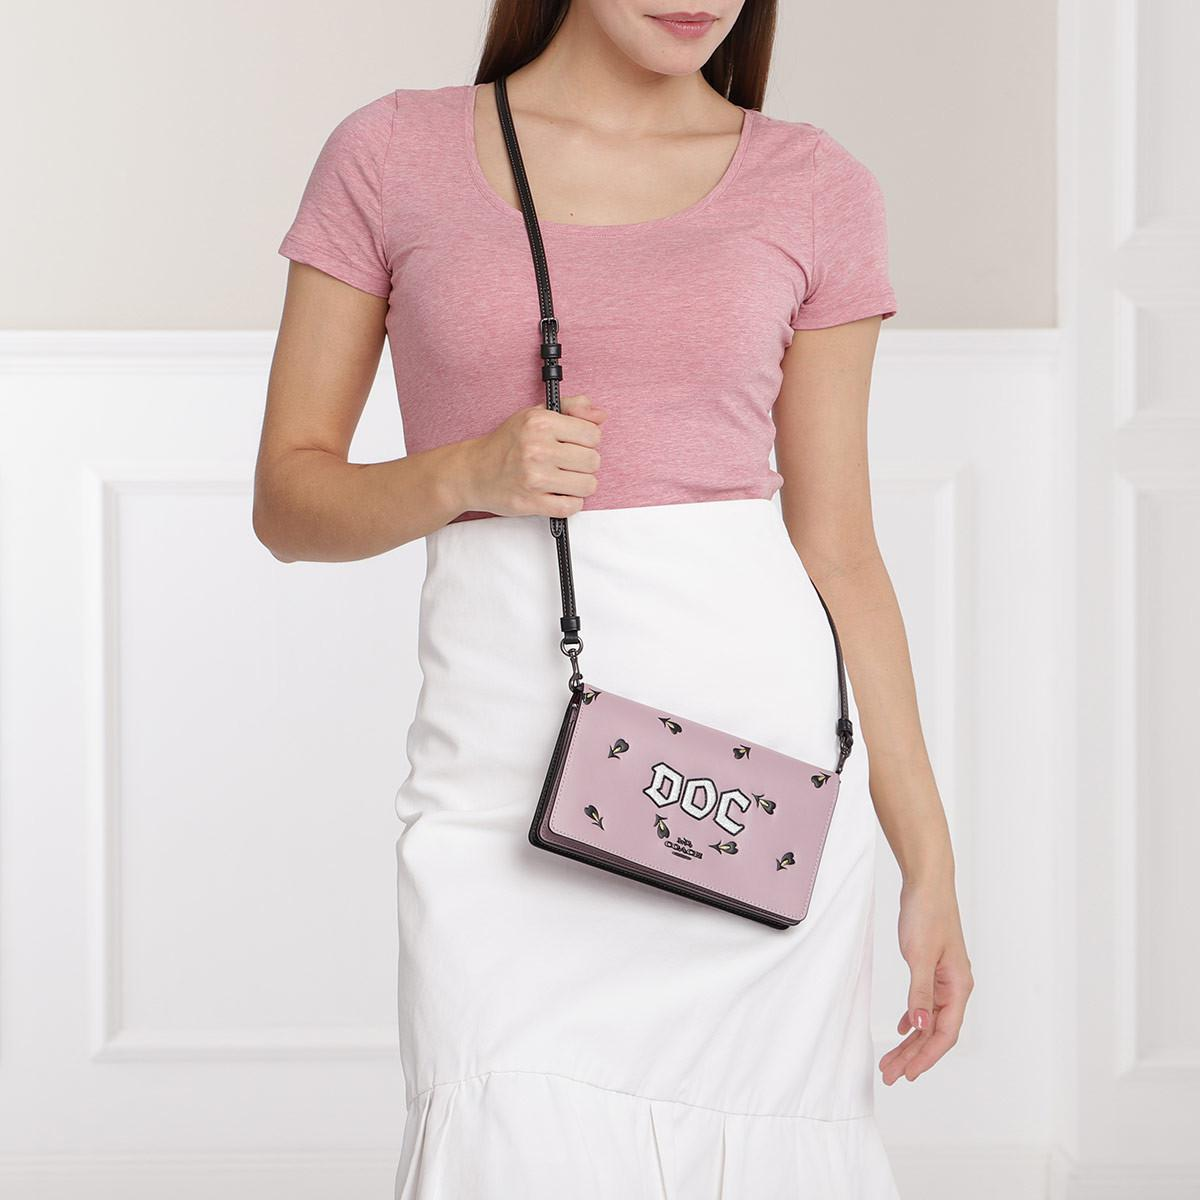 COACH Leather Doc Foldover Crossbody Clutch Jasmine in Pink